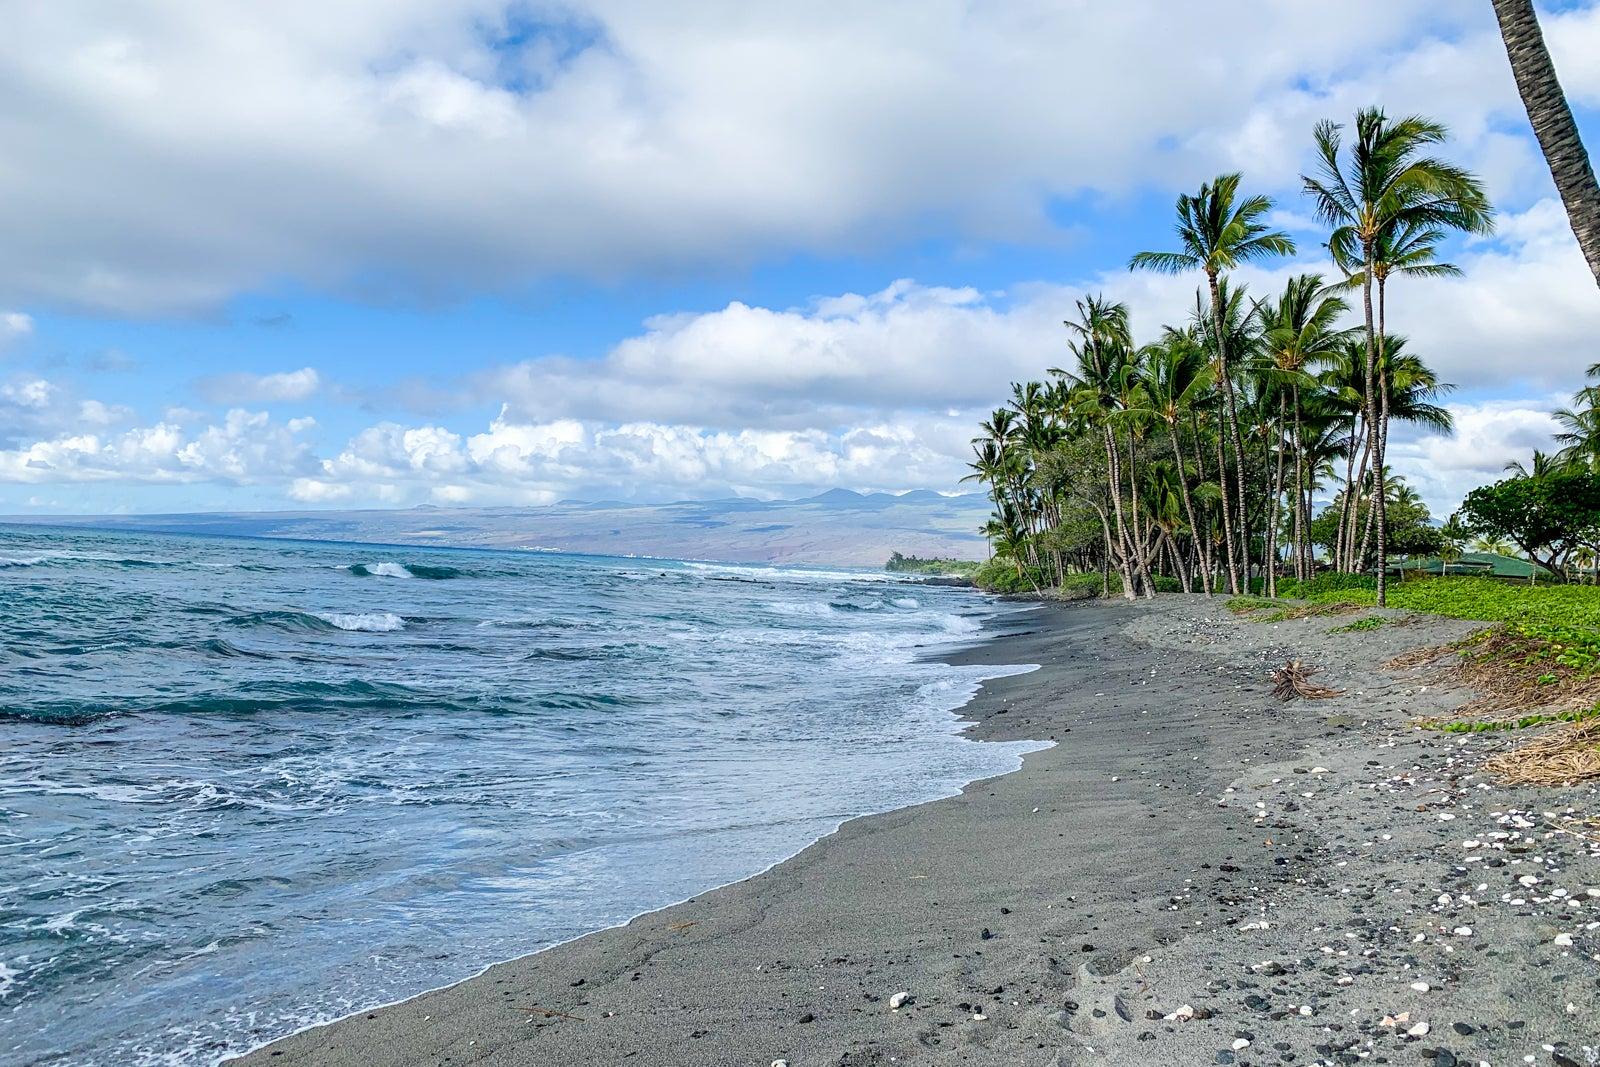 Hawaii pushing back date for vaccine passports, but good news on Kauai... image